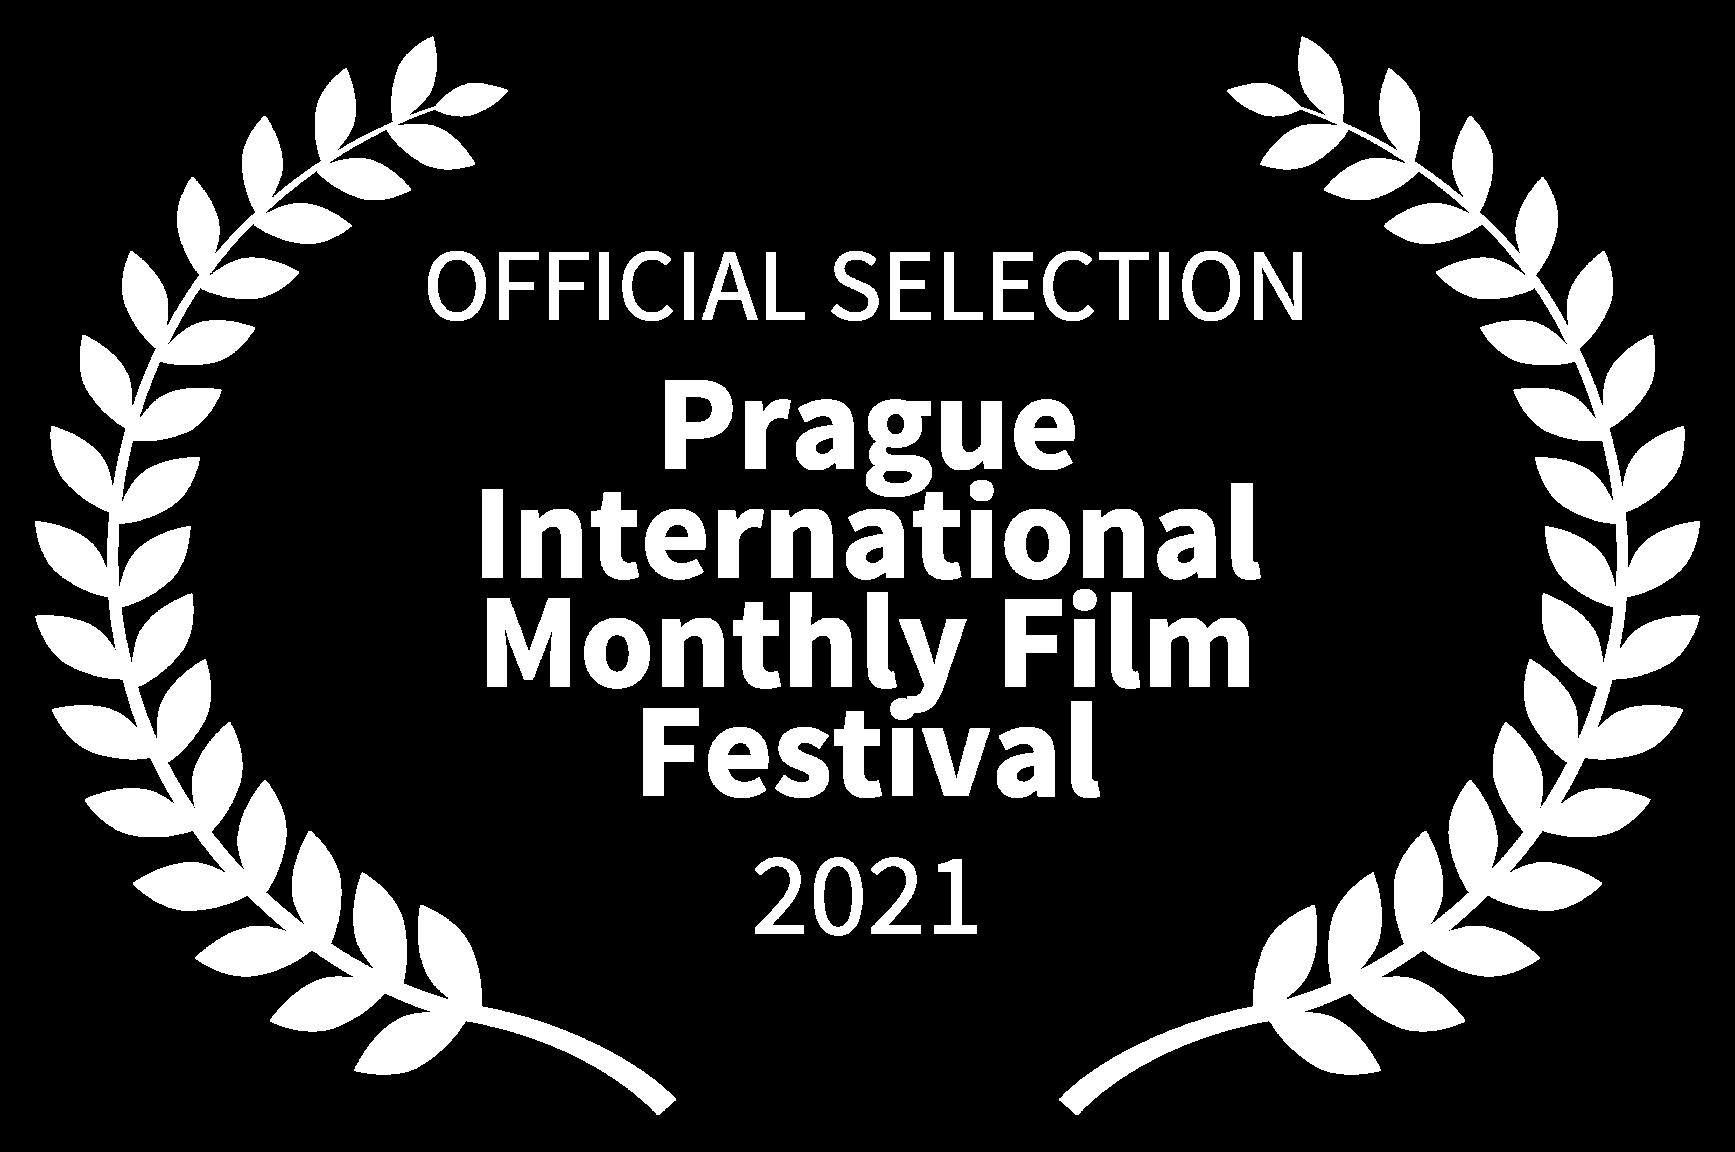 OFFICIAL SELECTION - Prague International Monthly Film Festival - 2021